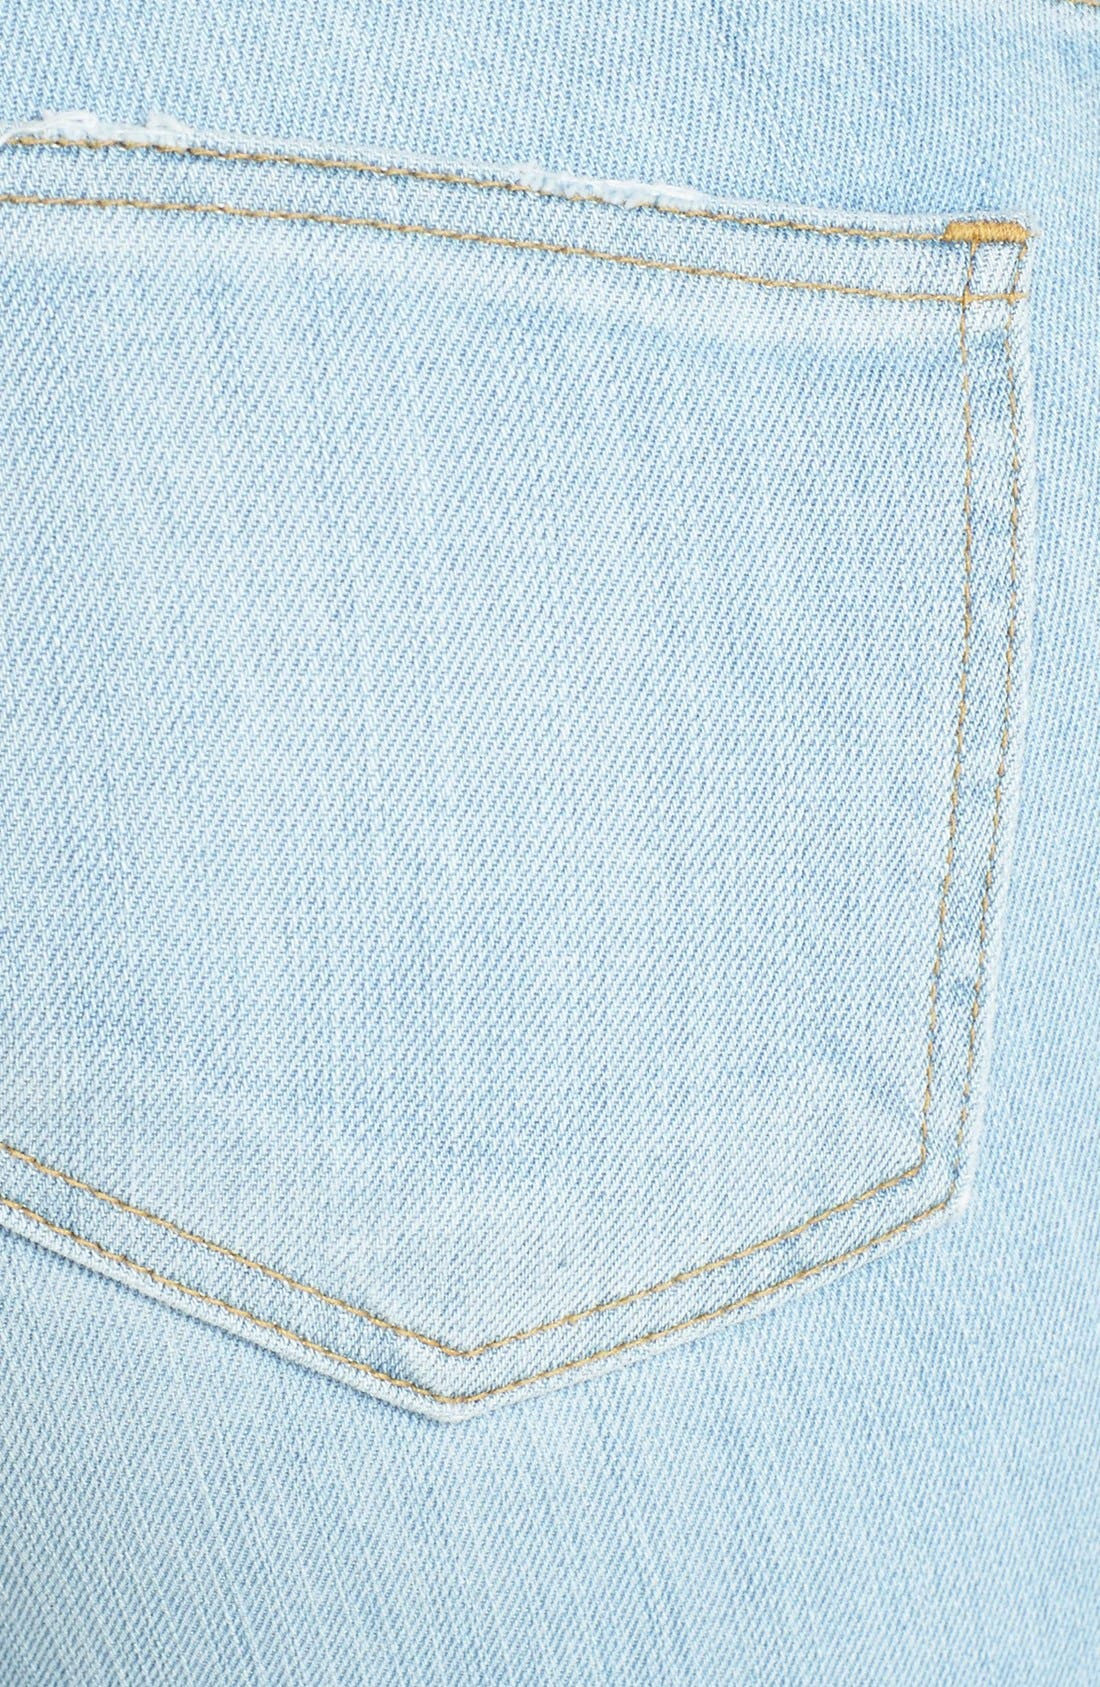 Alternate Image 3  - STS Blue 'Joey' Boyfriend Jeans (Light Wash)